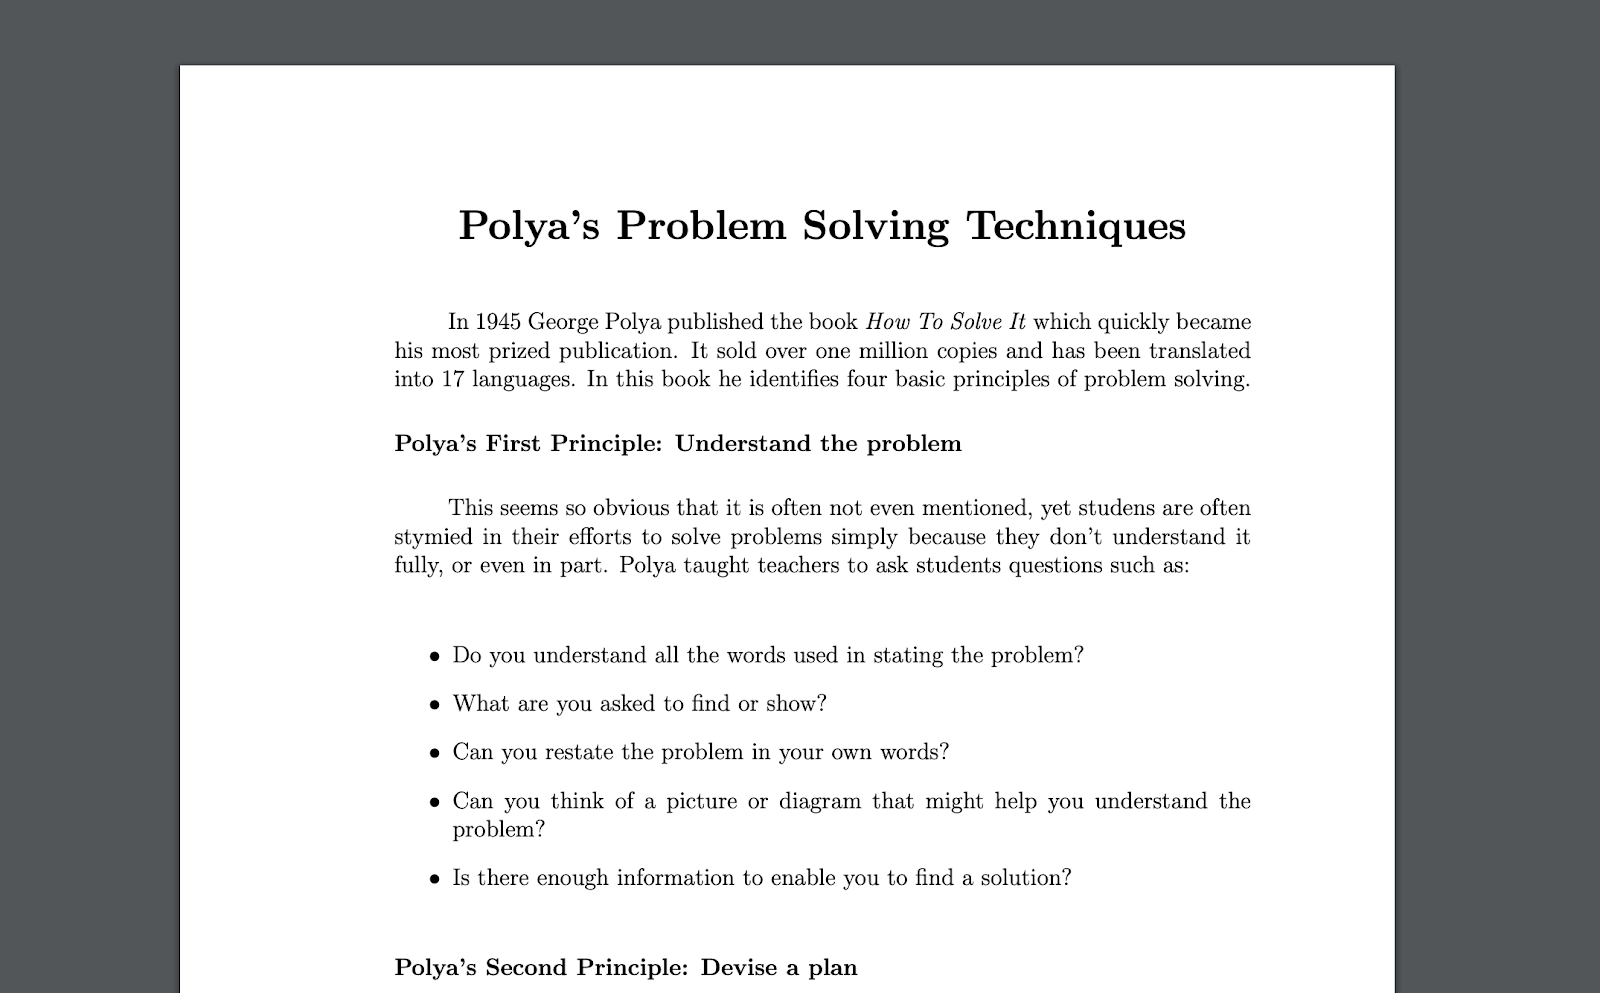 Polya's Problem Solving Techniques